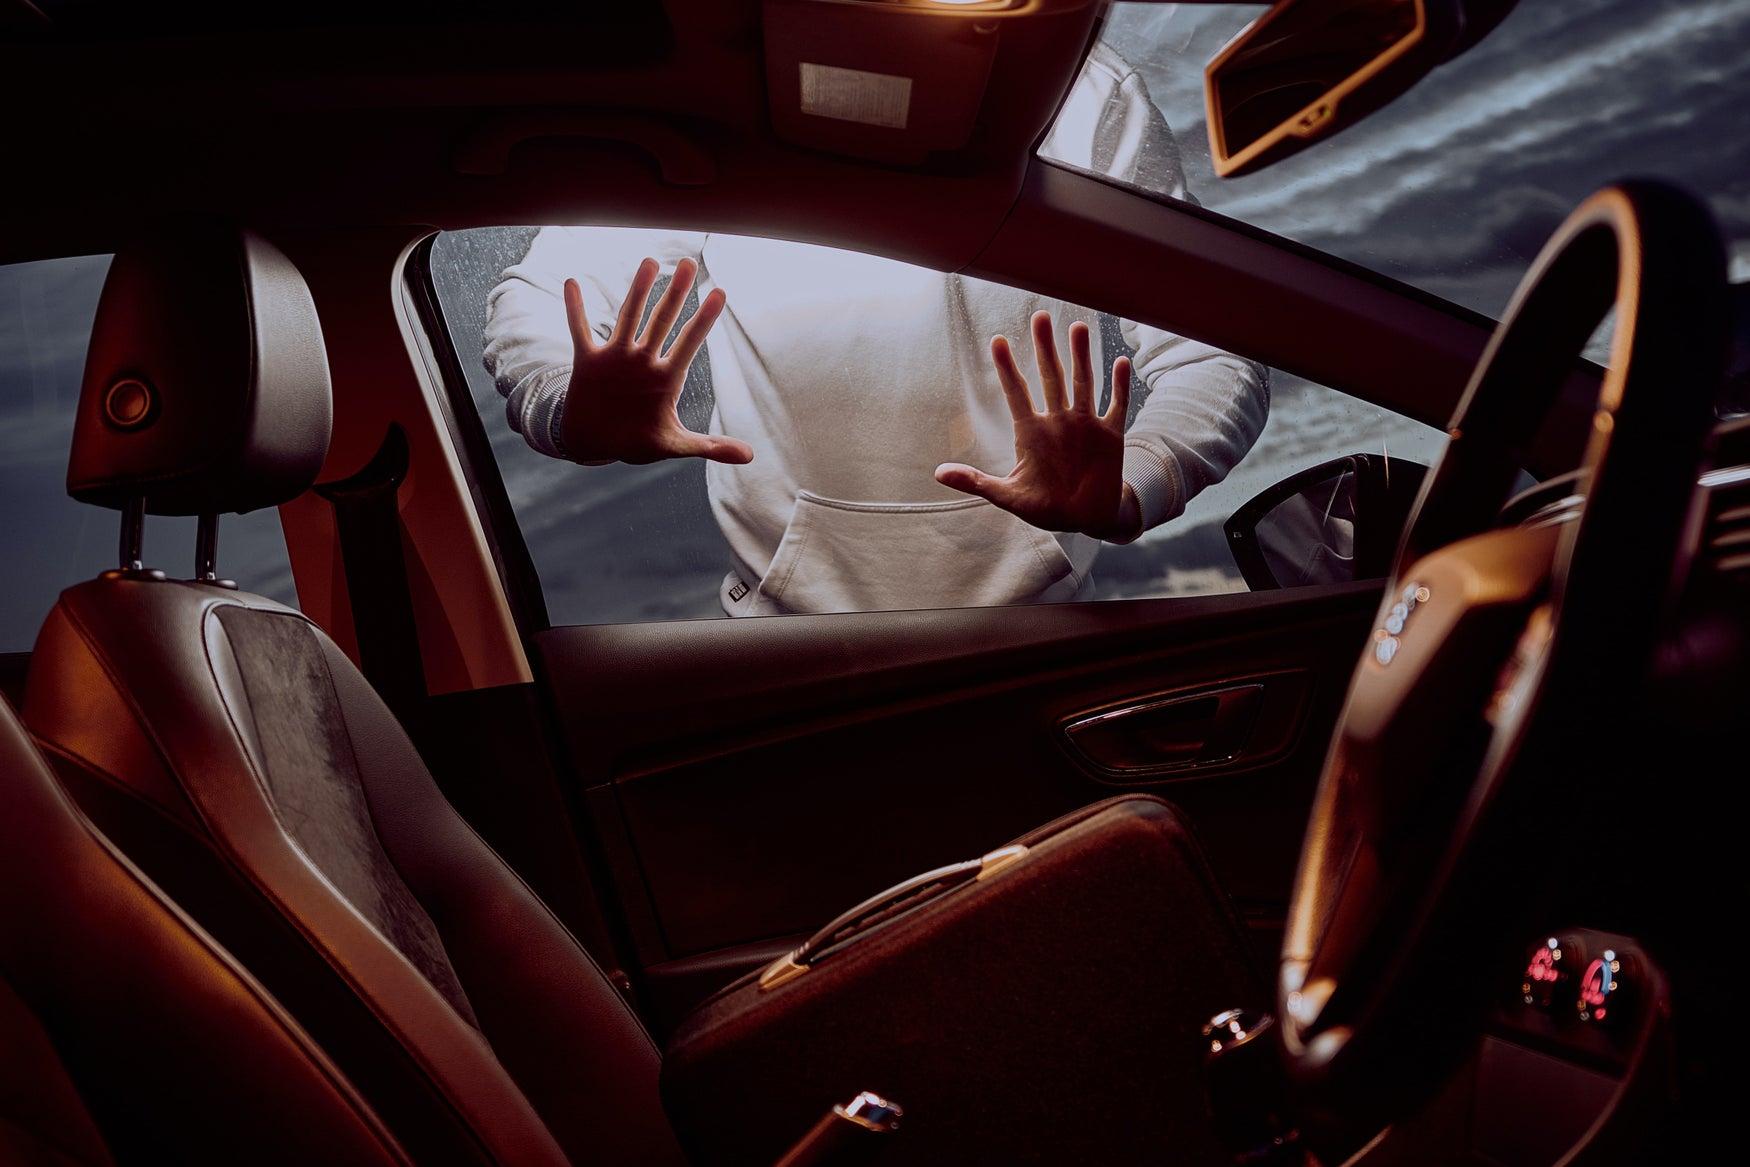 thief looking in car